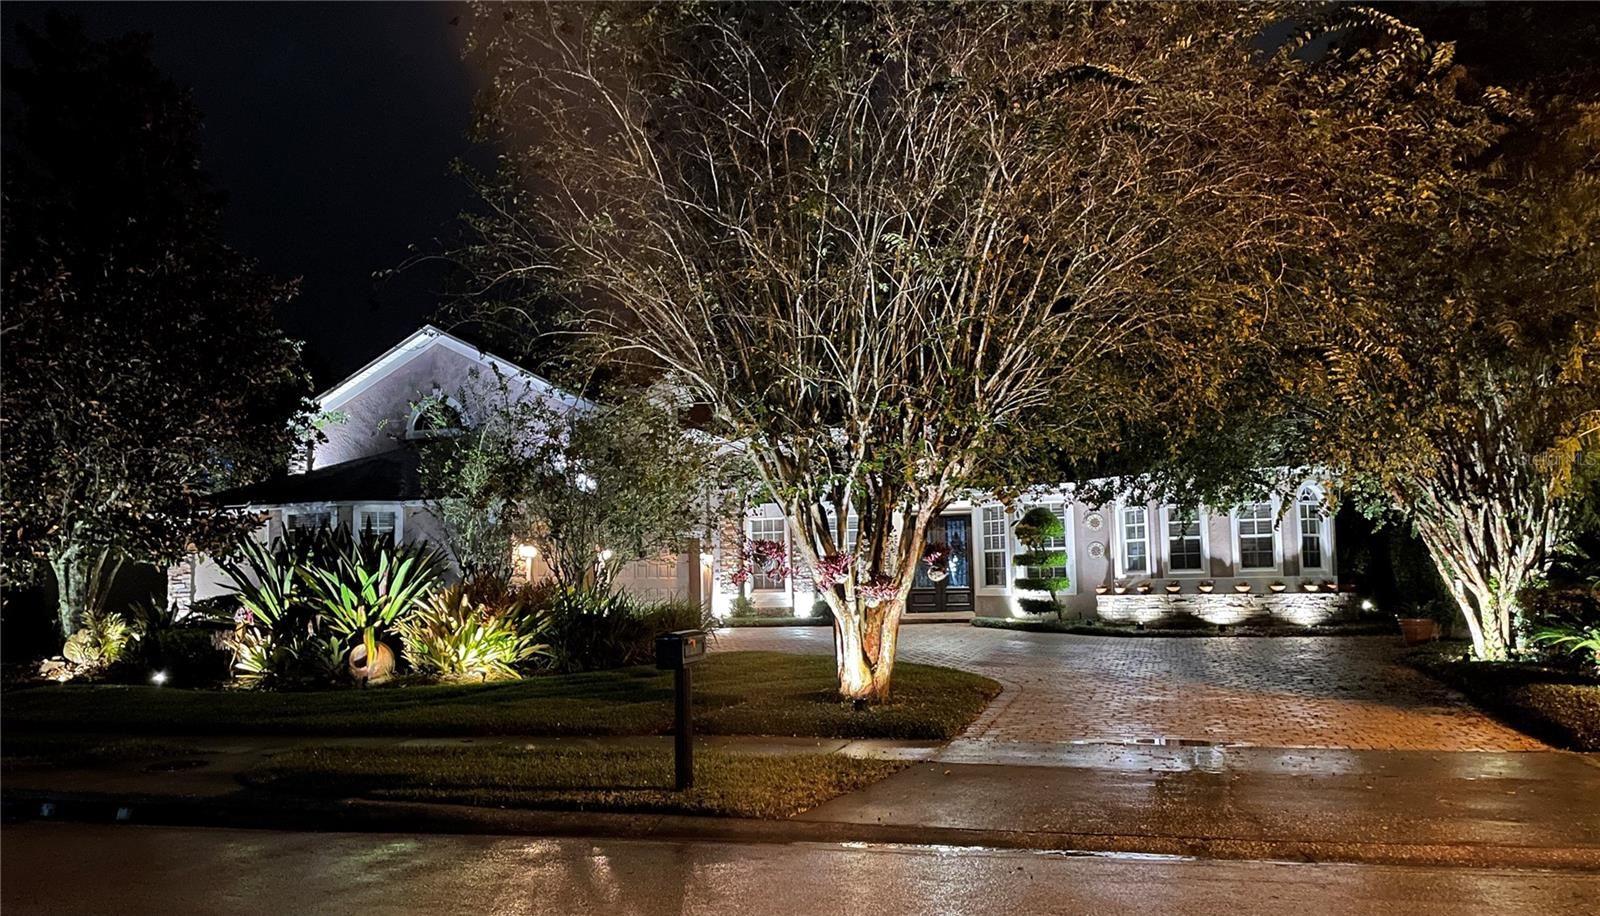 239 LAKERIDGE COURT, Winter Springs, FL 32708 - MLS#: O5982204